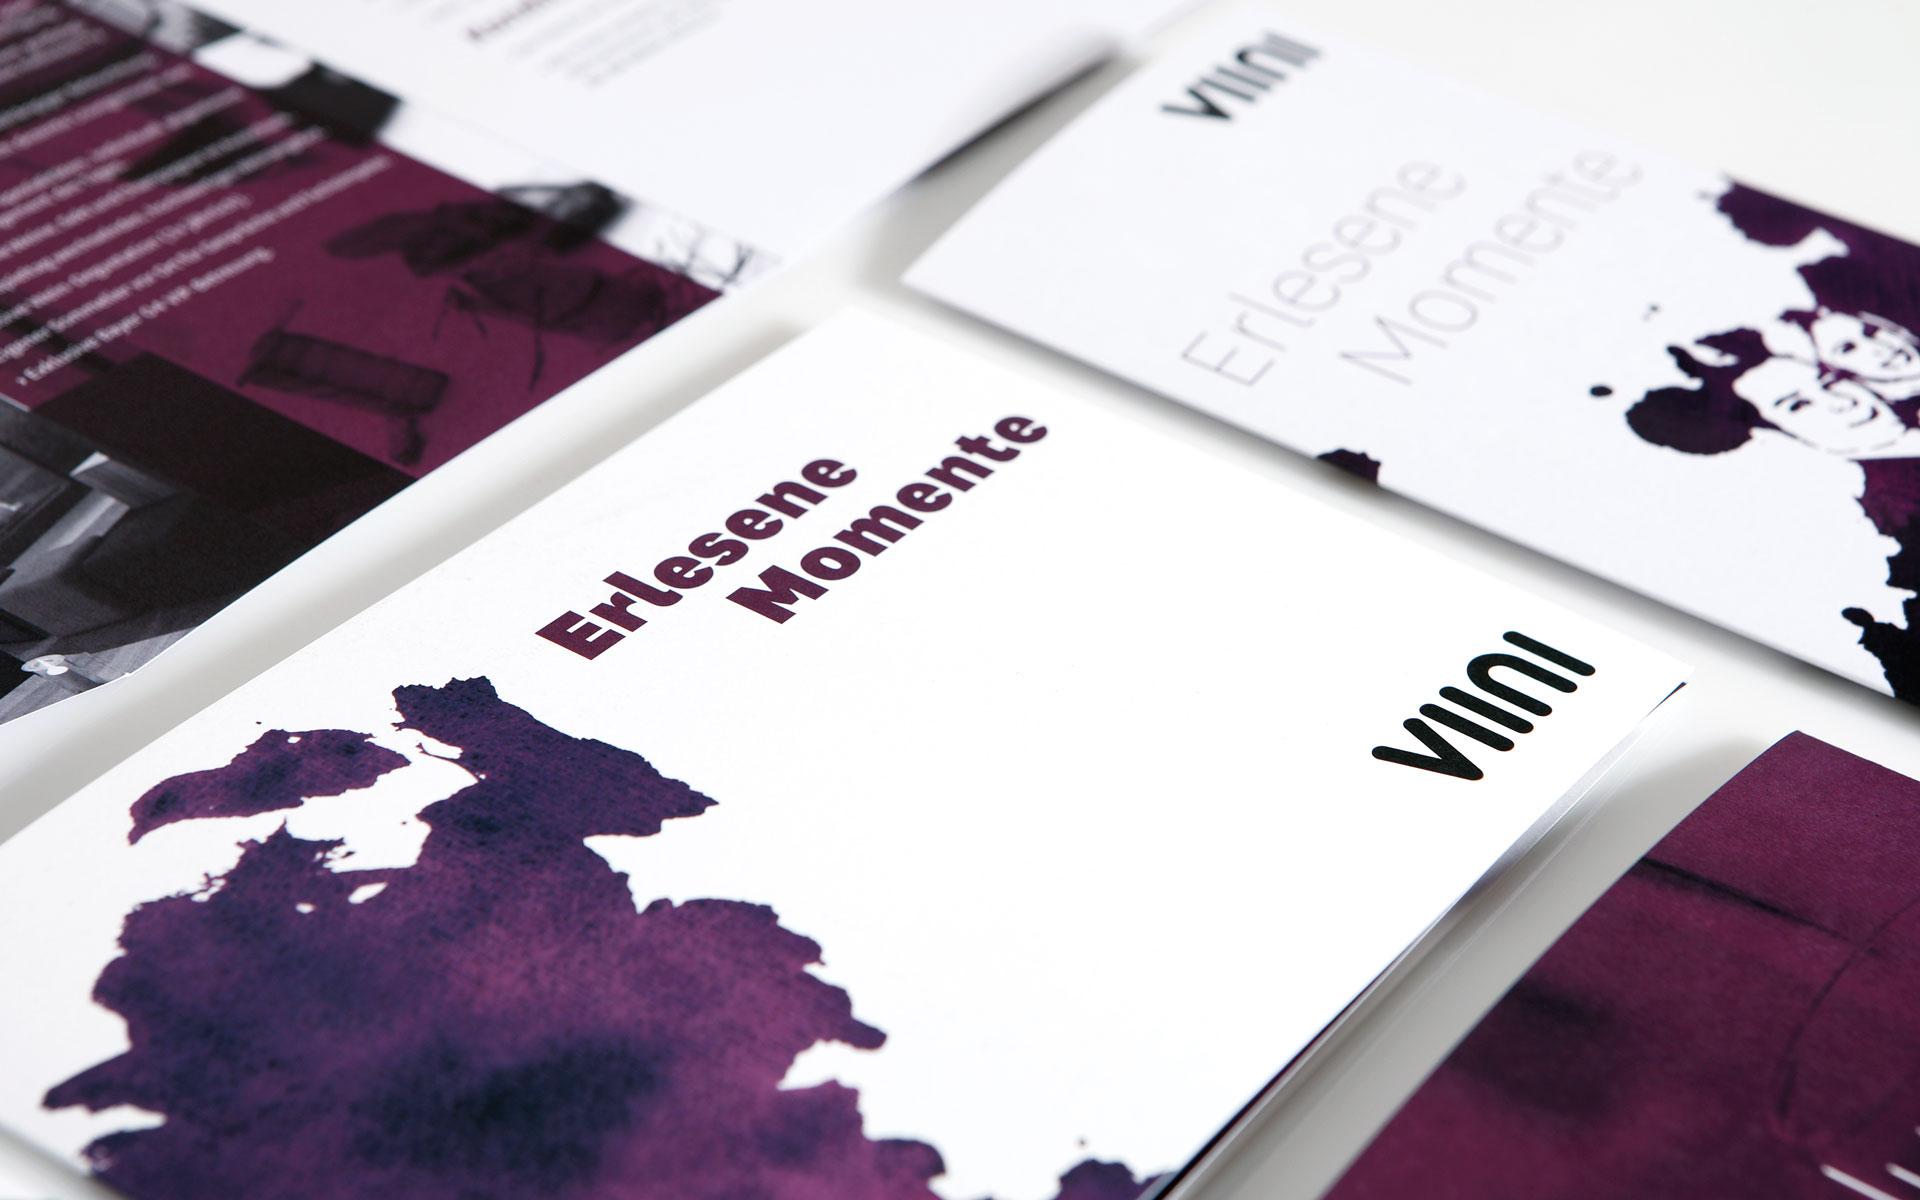 VIINI Brand Identity, Corporate Design, Broschürentitel, Detail